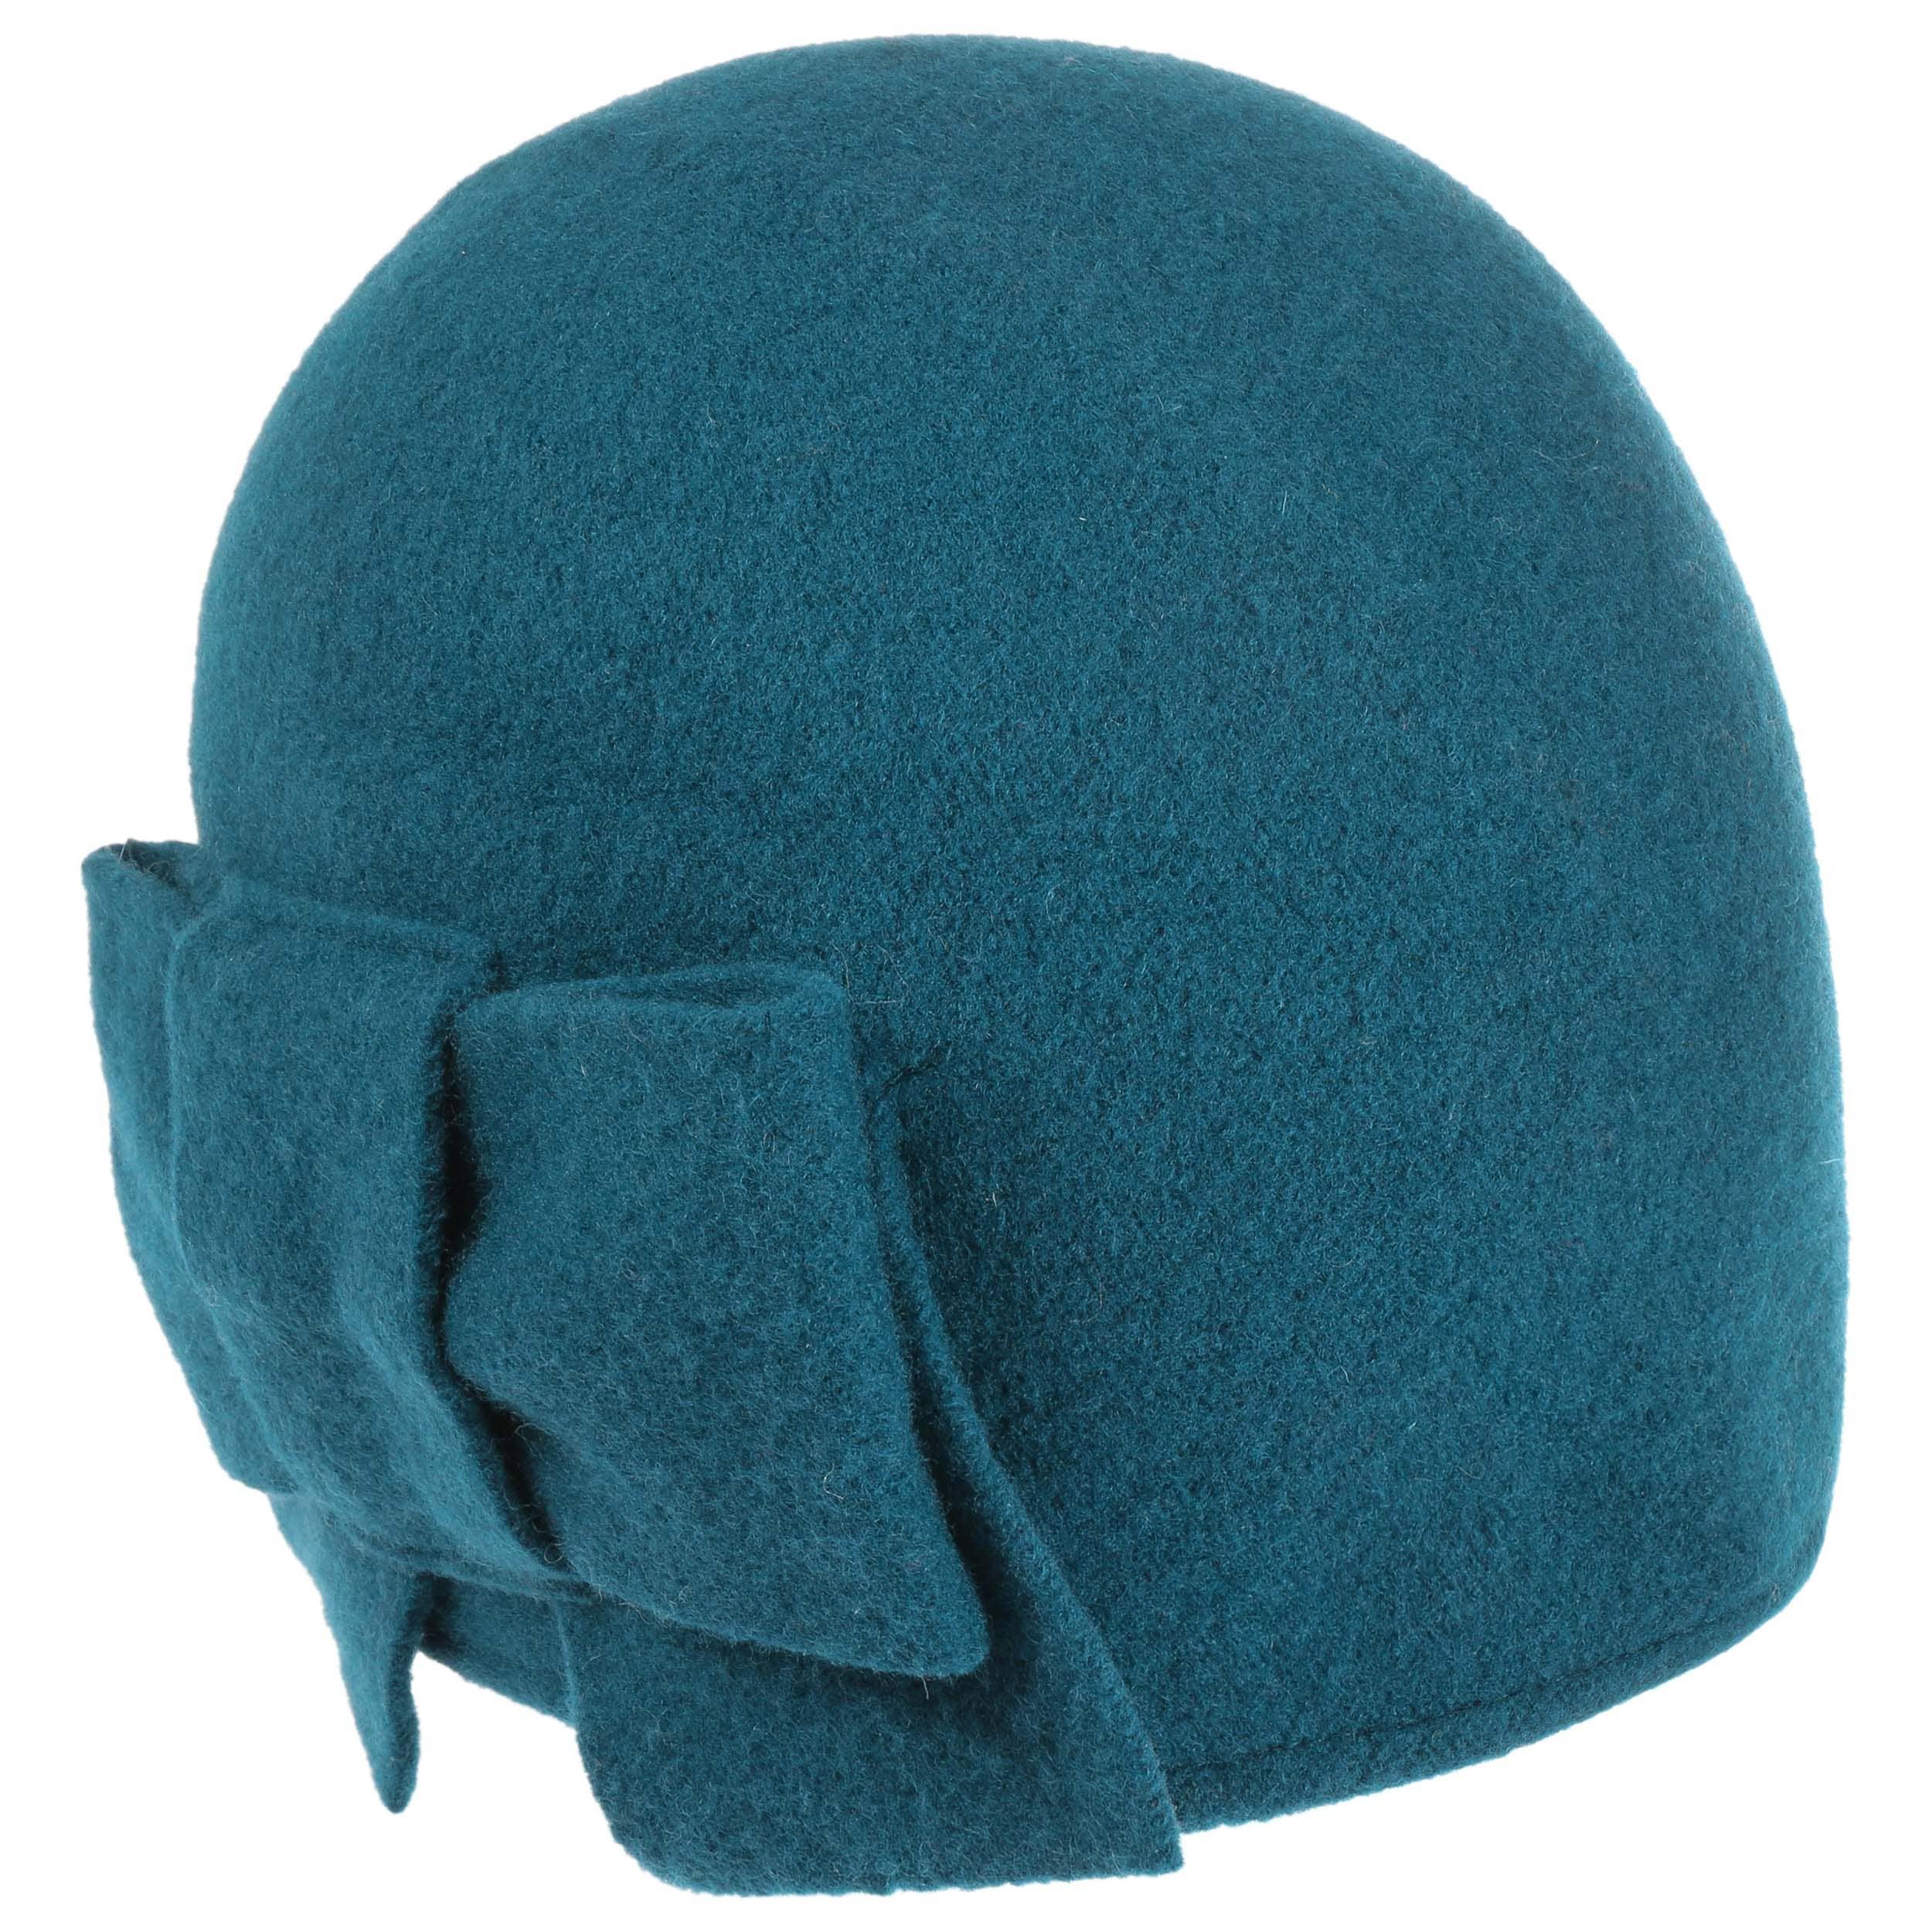 ... Litika Milled Wool Hat Loop by Seeberger - petrol blue 1 ... c18b4f8fce6